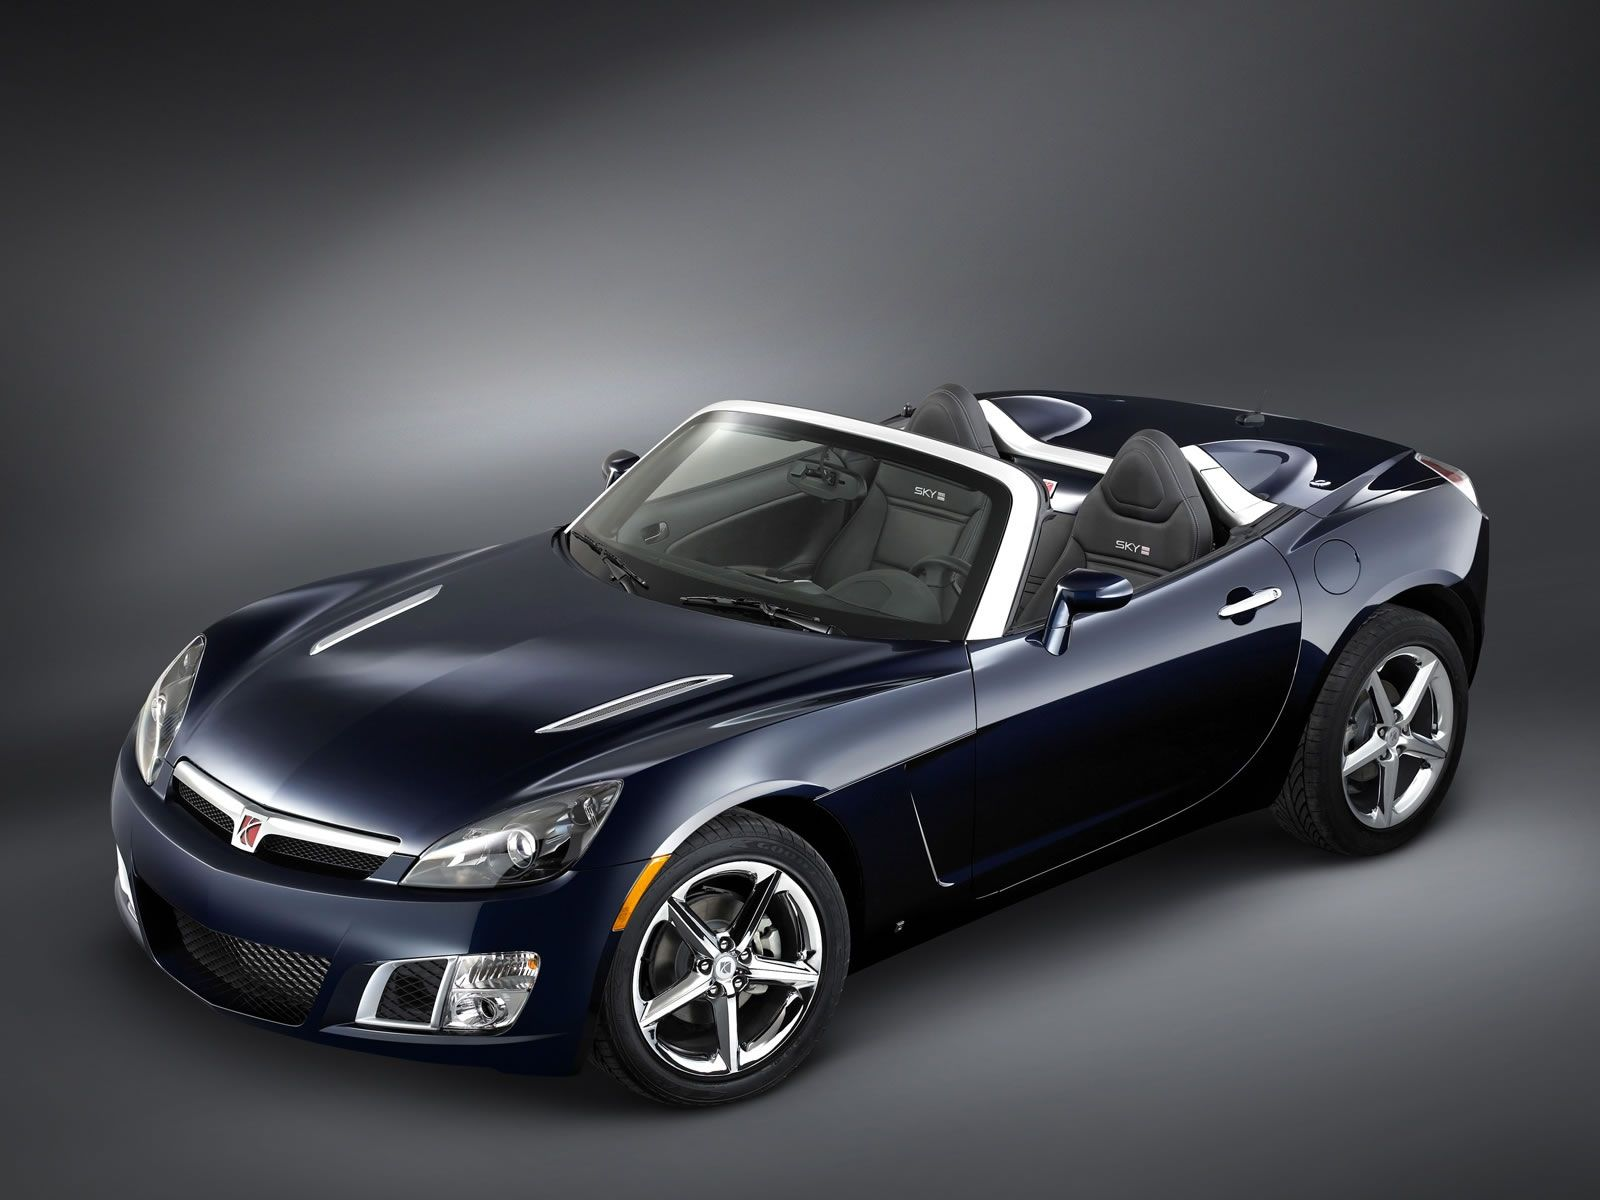 Saturn Skye Redline 260 Hp Turbo Charged 4 Cyl My Car Mine